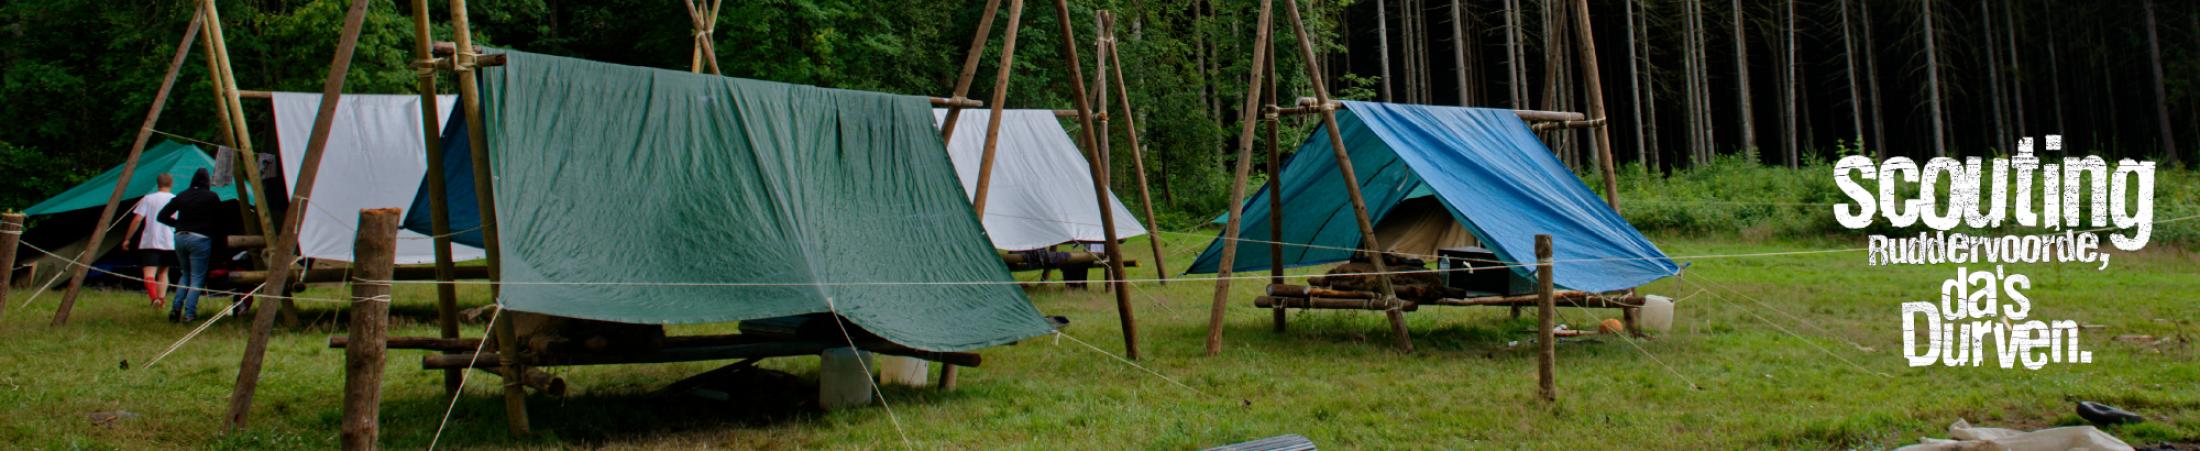 Scouts & Gidsen Ruddervoorde